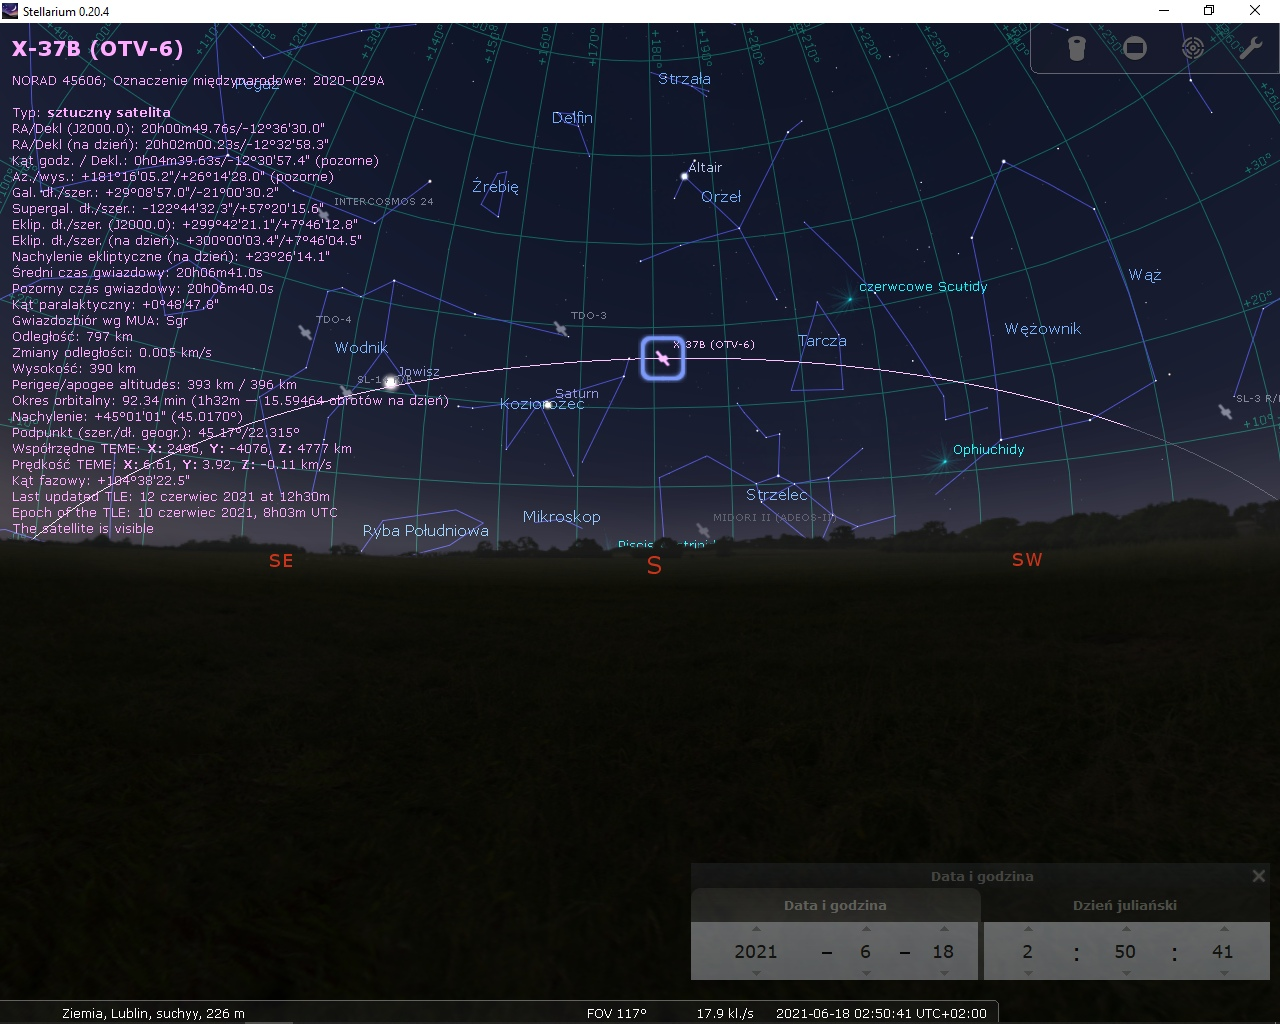 OTV-6_18-06-2021_2-50-41_Lublin_1.jpg.12d11d855494eb75bc4c5376dbd2dd8d.jpg